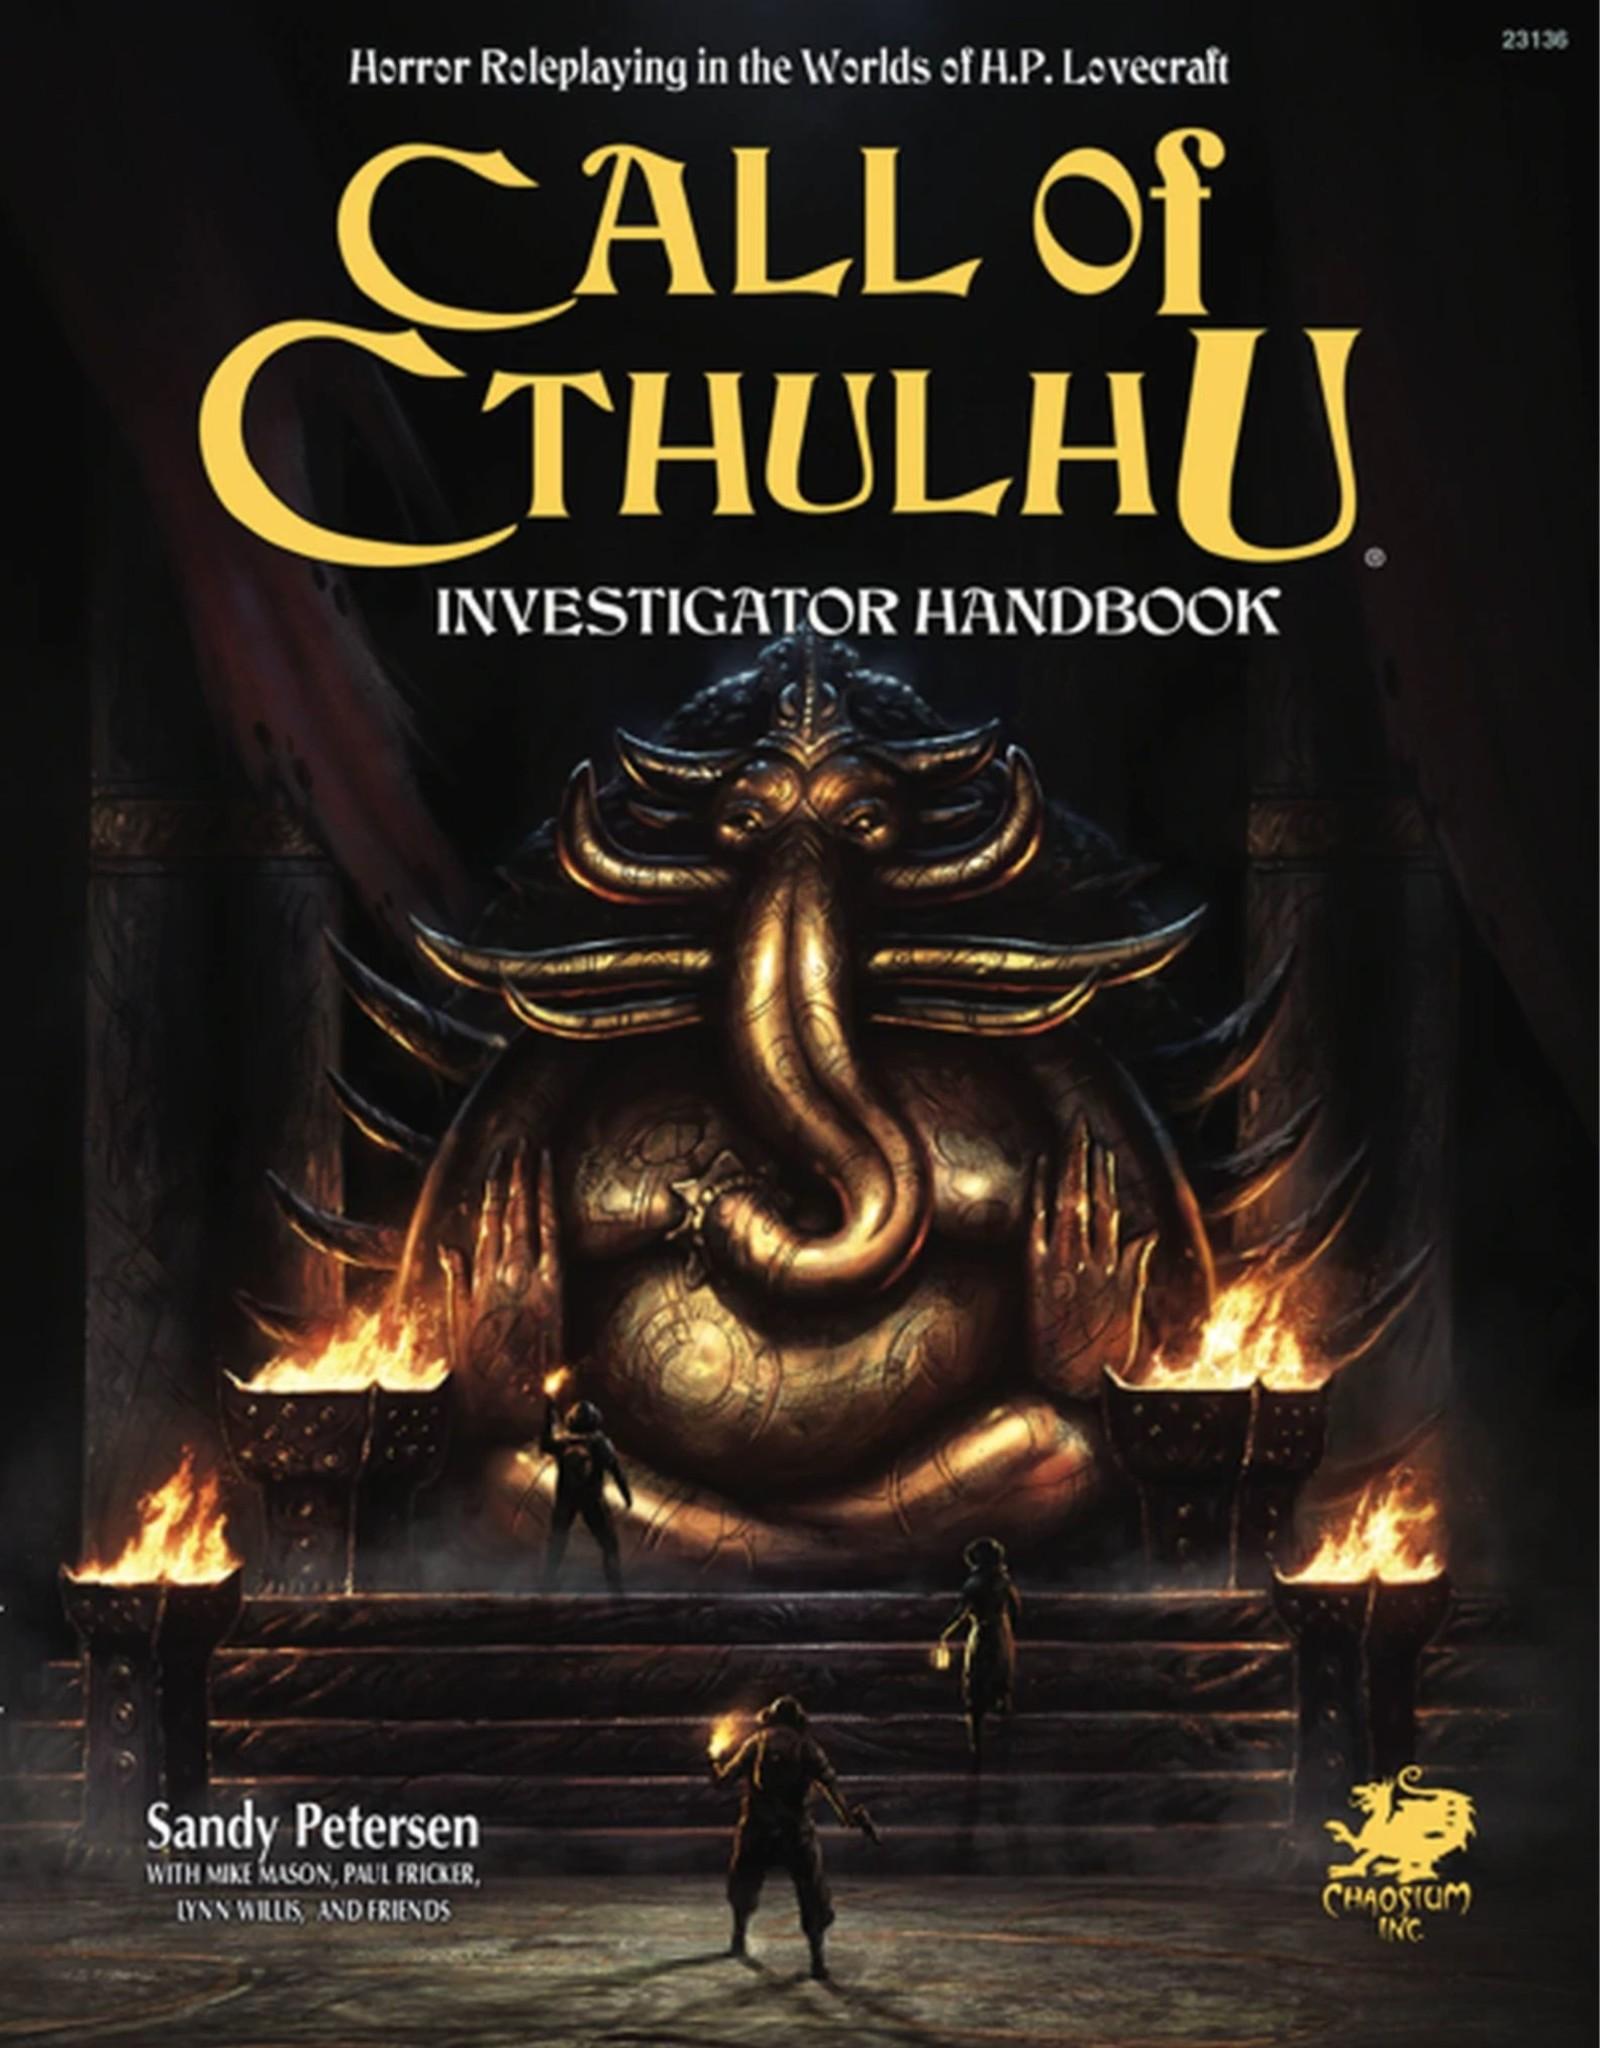 Call of Cthulhu Call of Cthulu Investigator Handbook